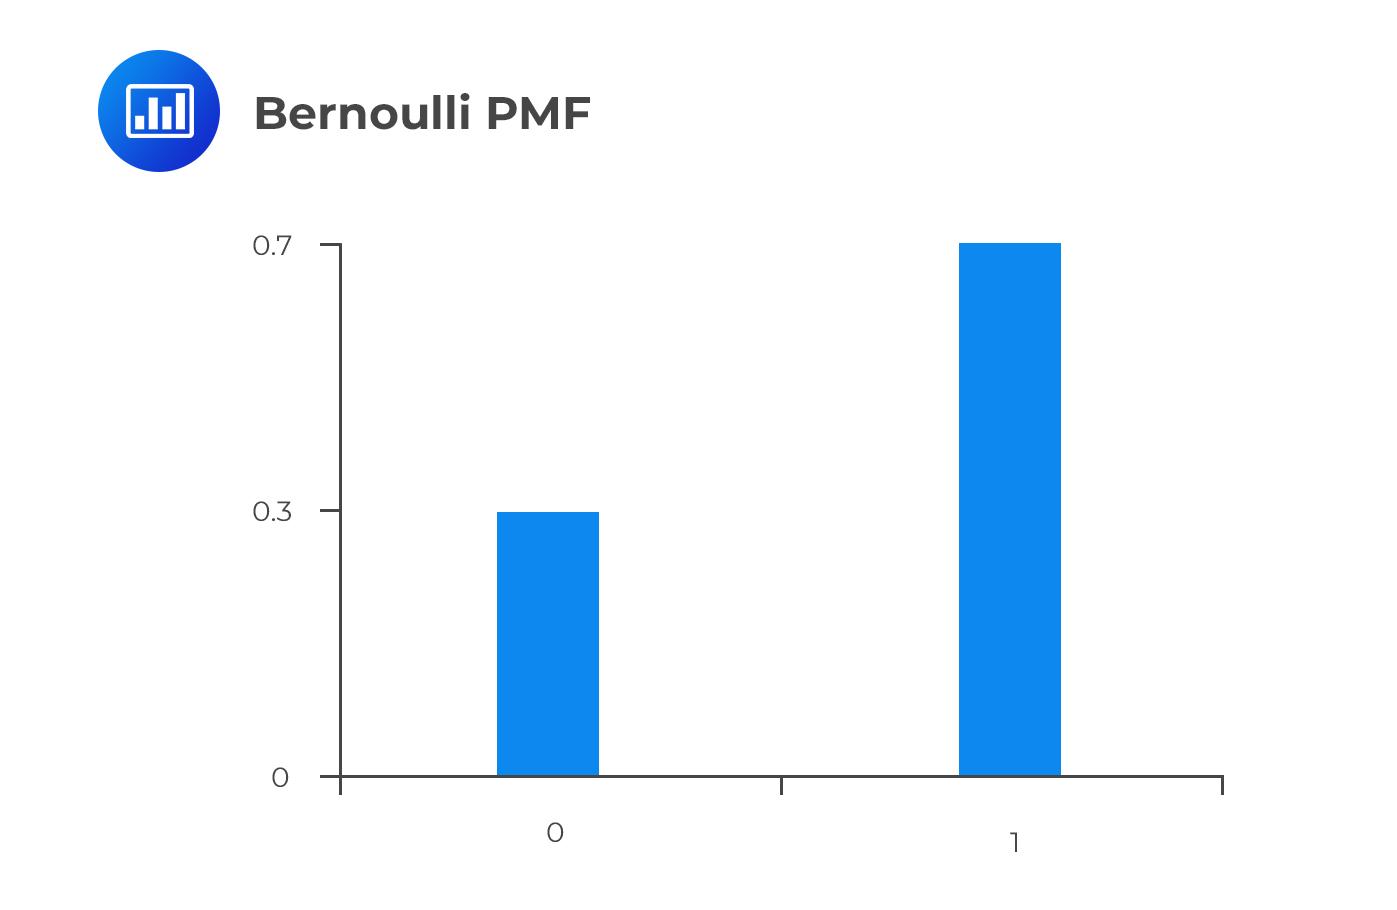 Bernouilli PMF